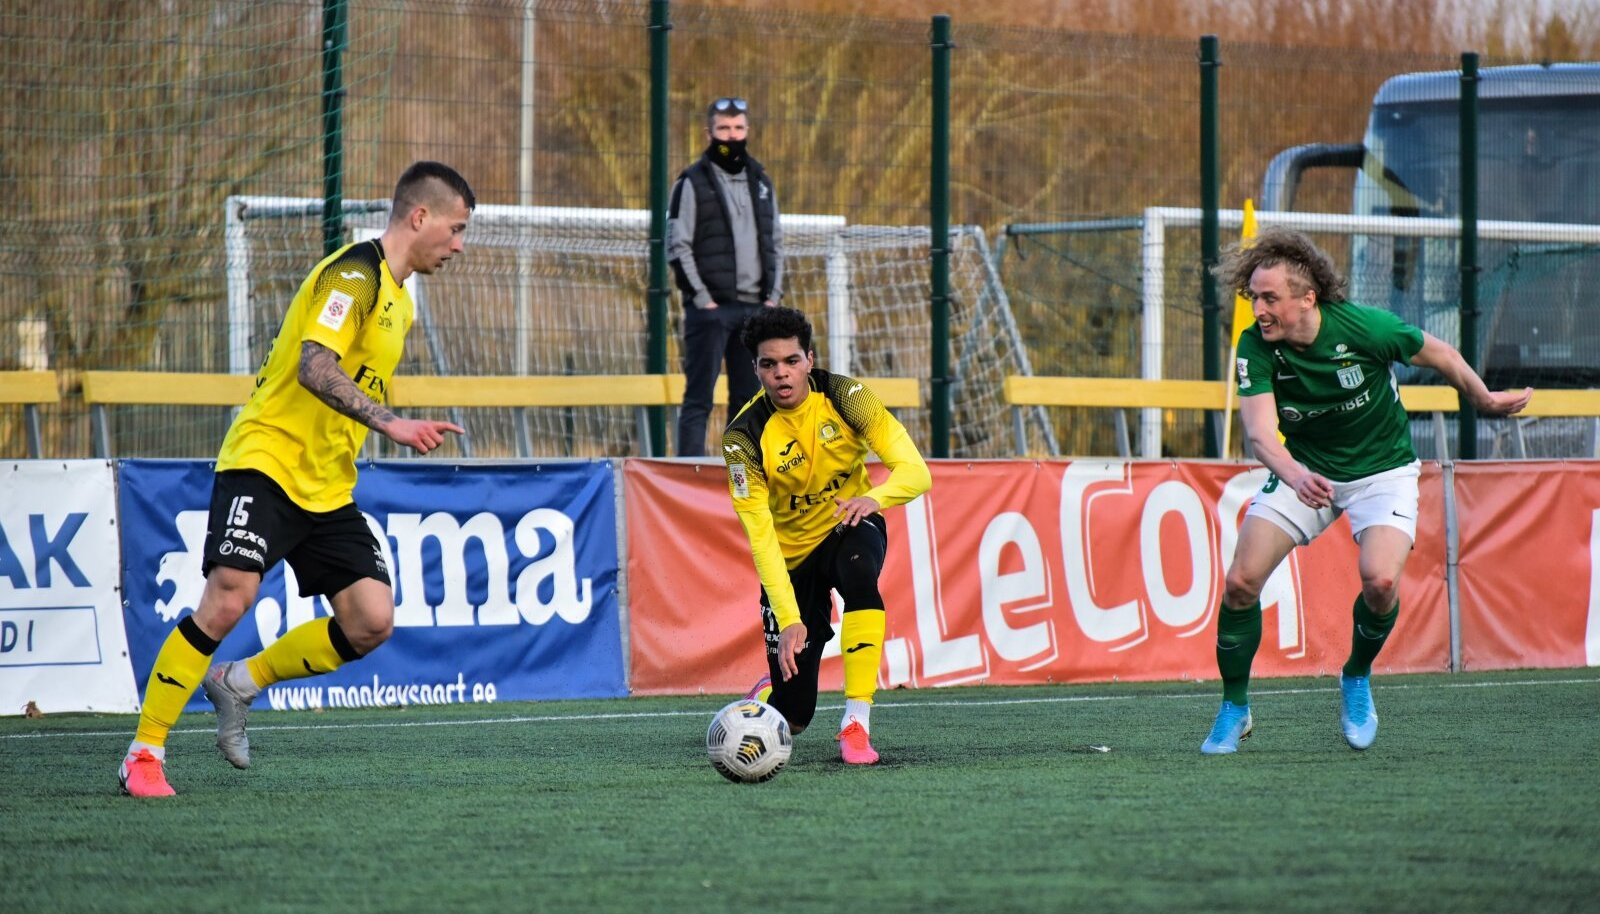 Premium liiga mäng Tallinna FC Flora - Viljandi JK Tulevik.